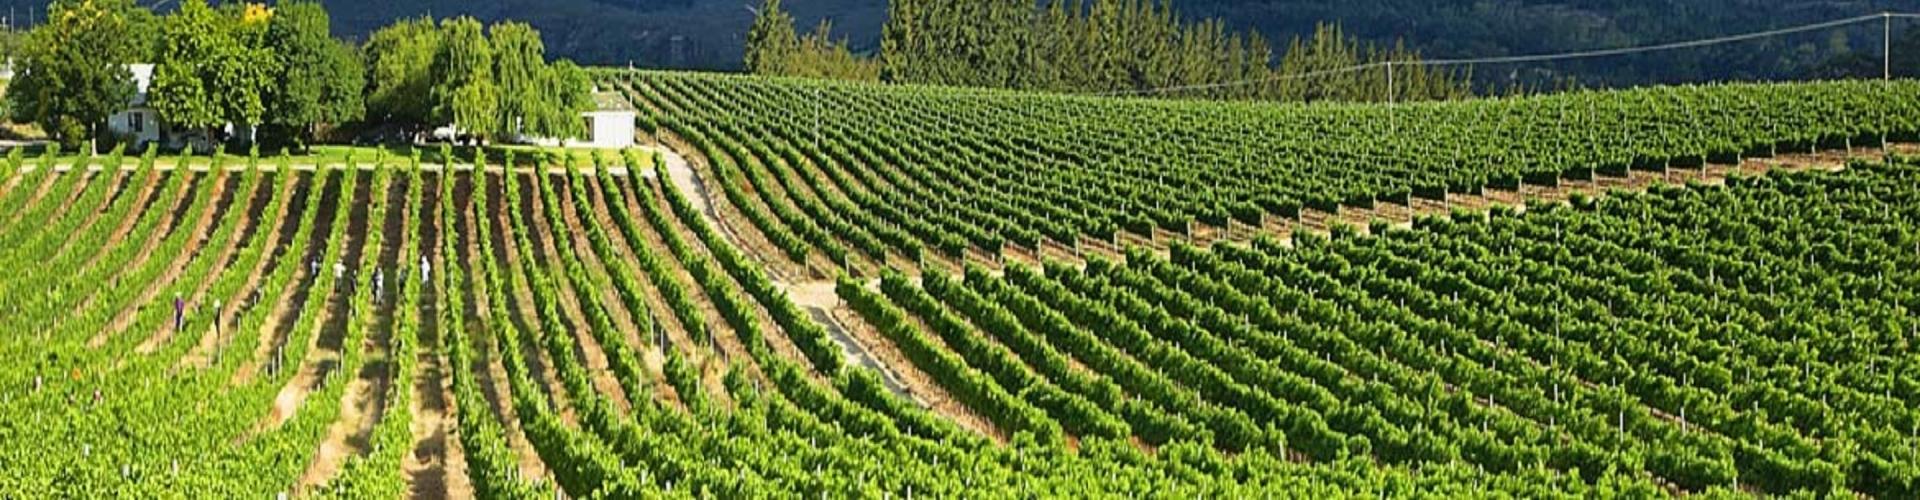 cape-winelands-zuid-afrika_2